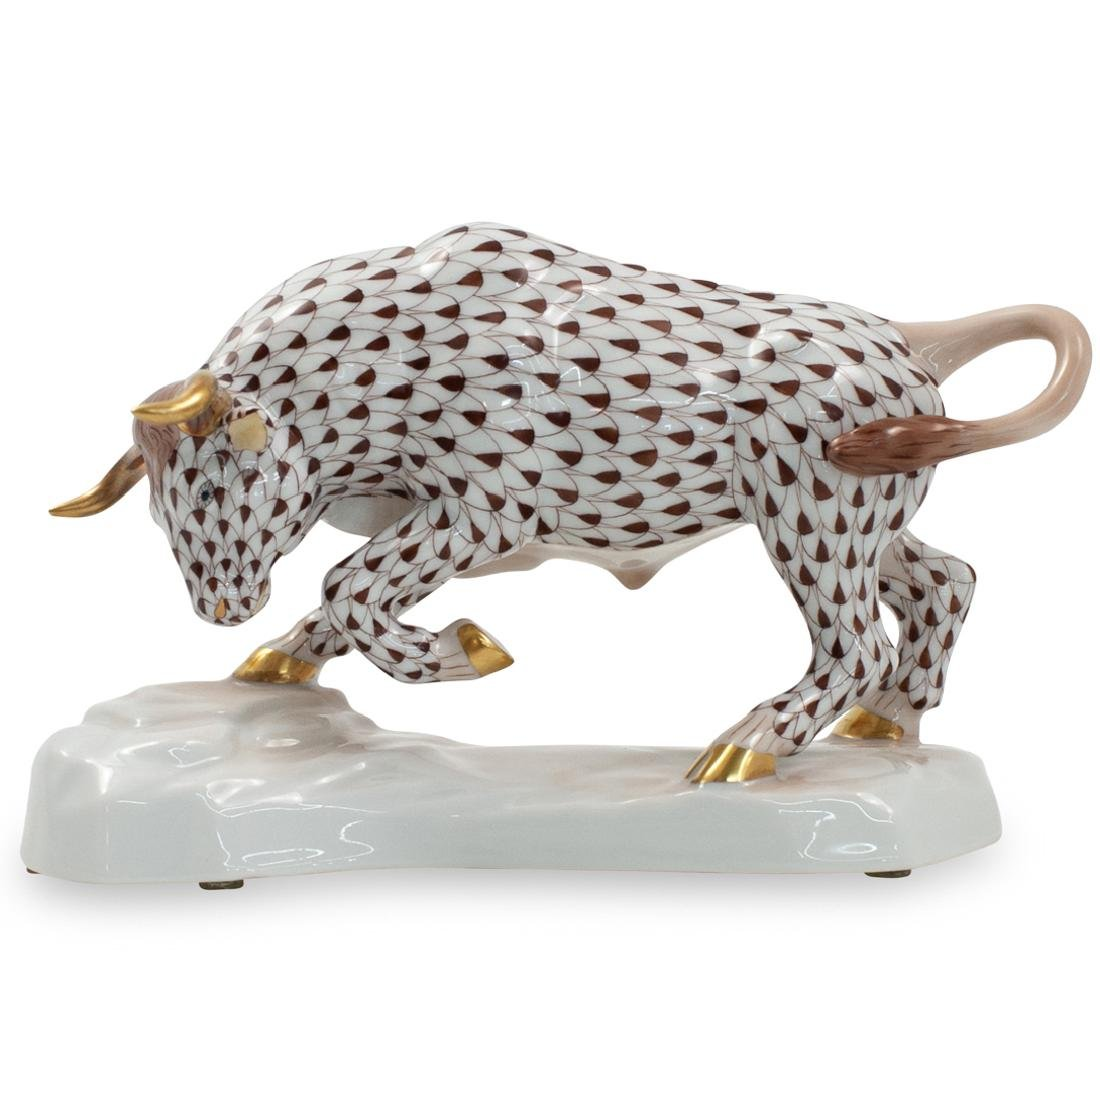 Herend Porcelain Bull Figurine